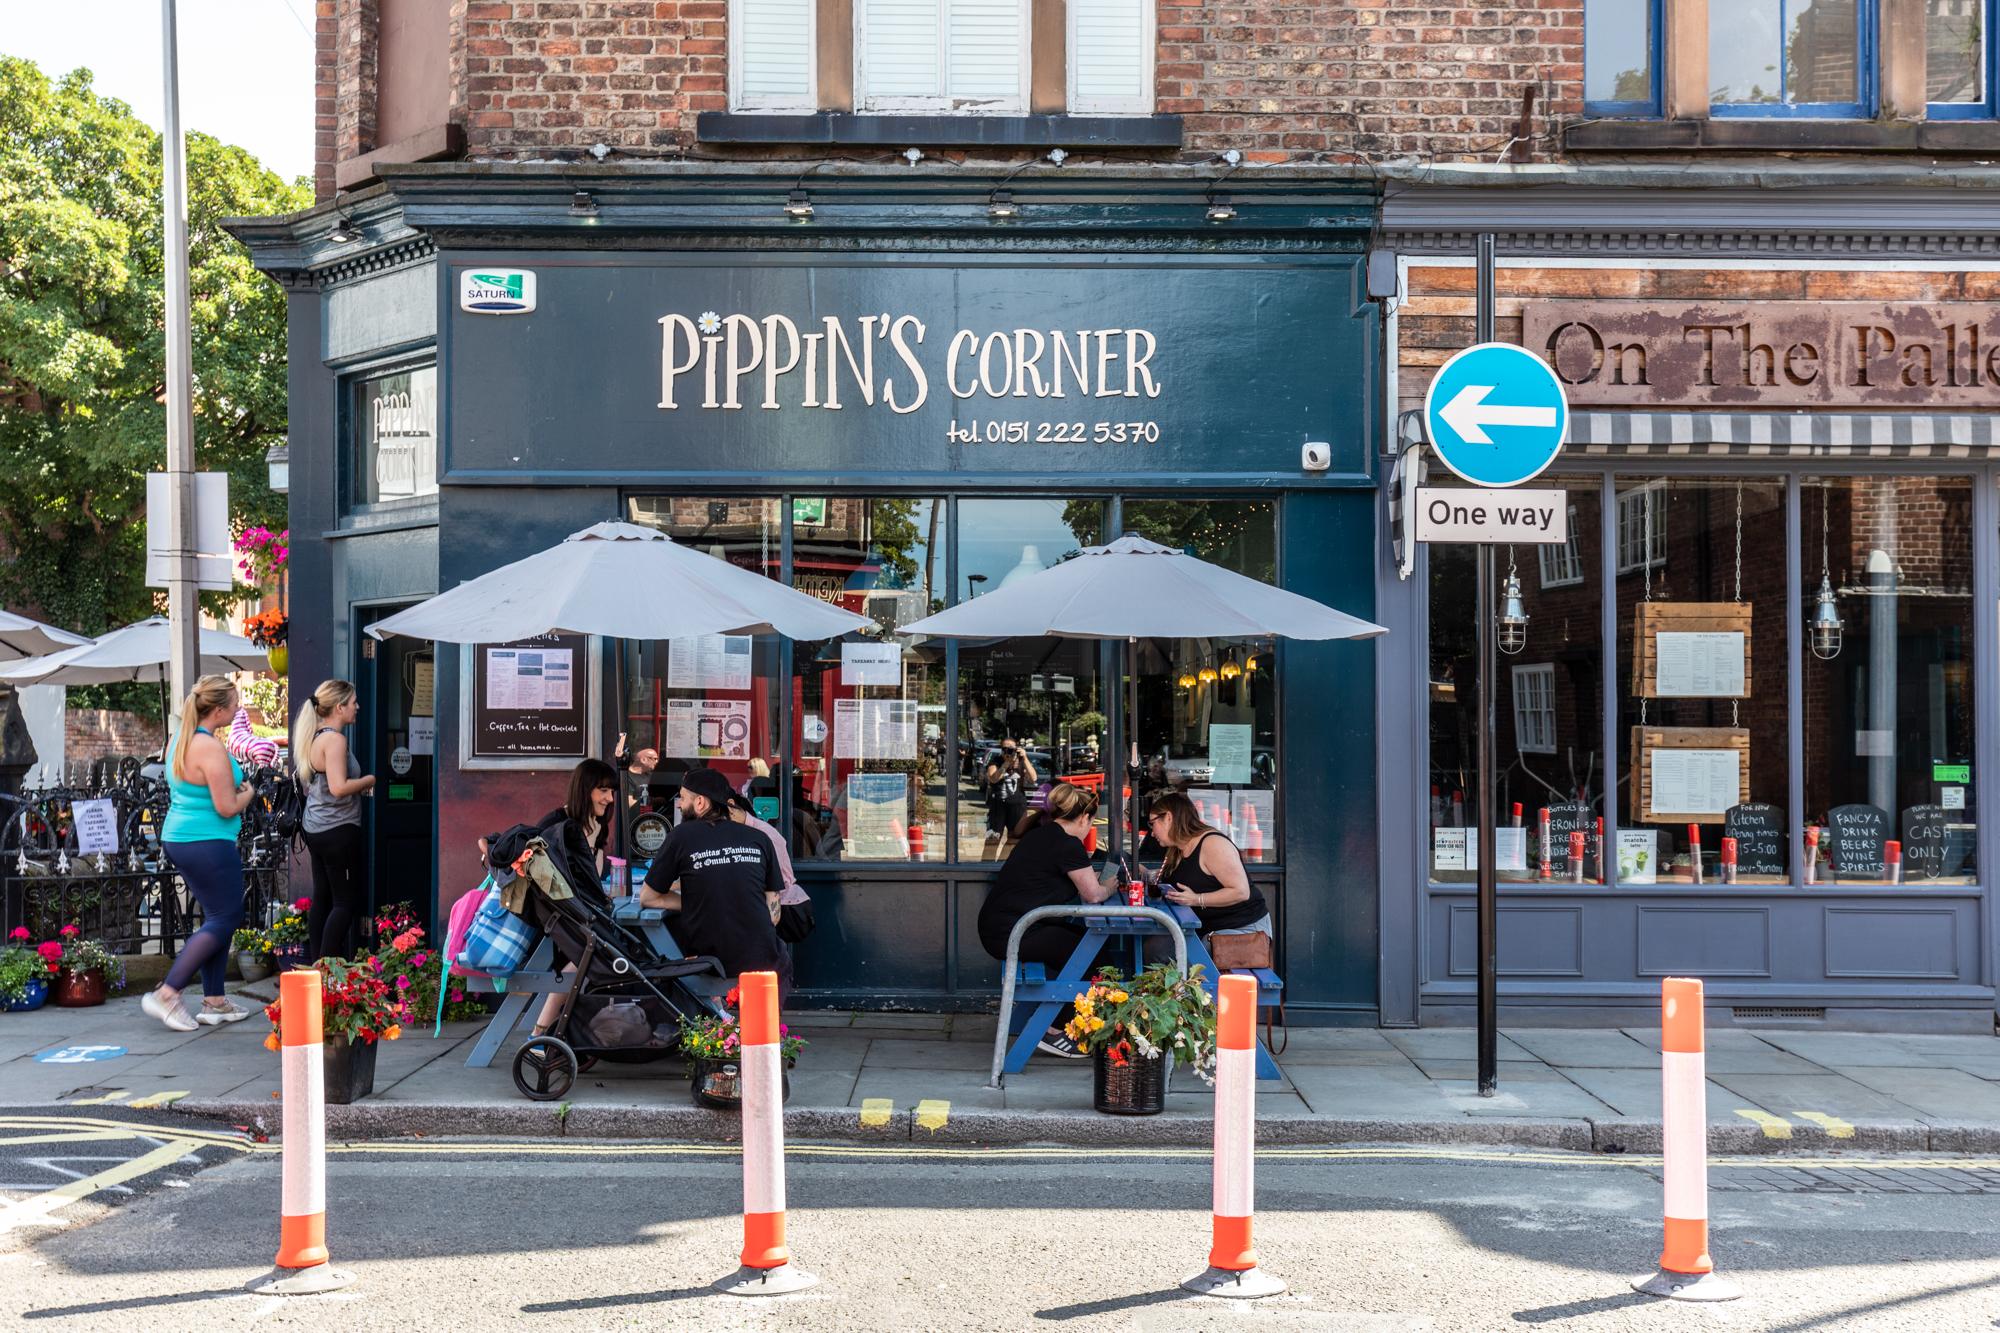 Pippin's Corner